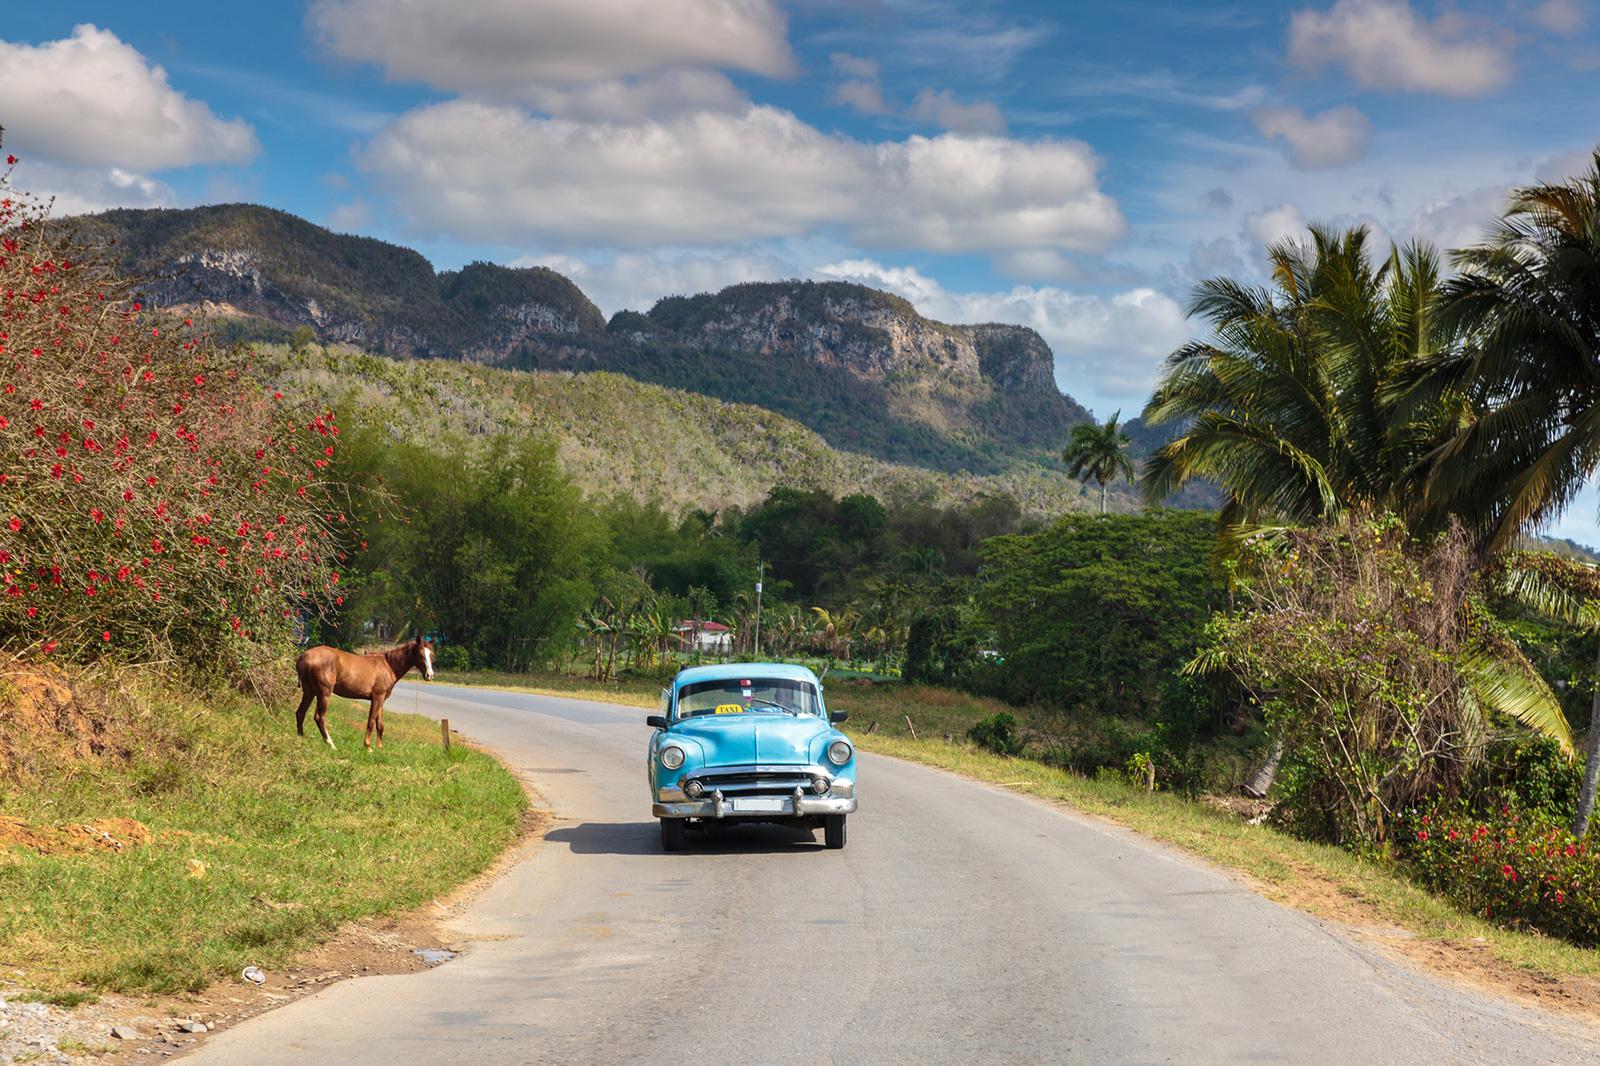 Carte Cuba Guide Du Routard.Cuba Itineraires Conseilles Routard Com